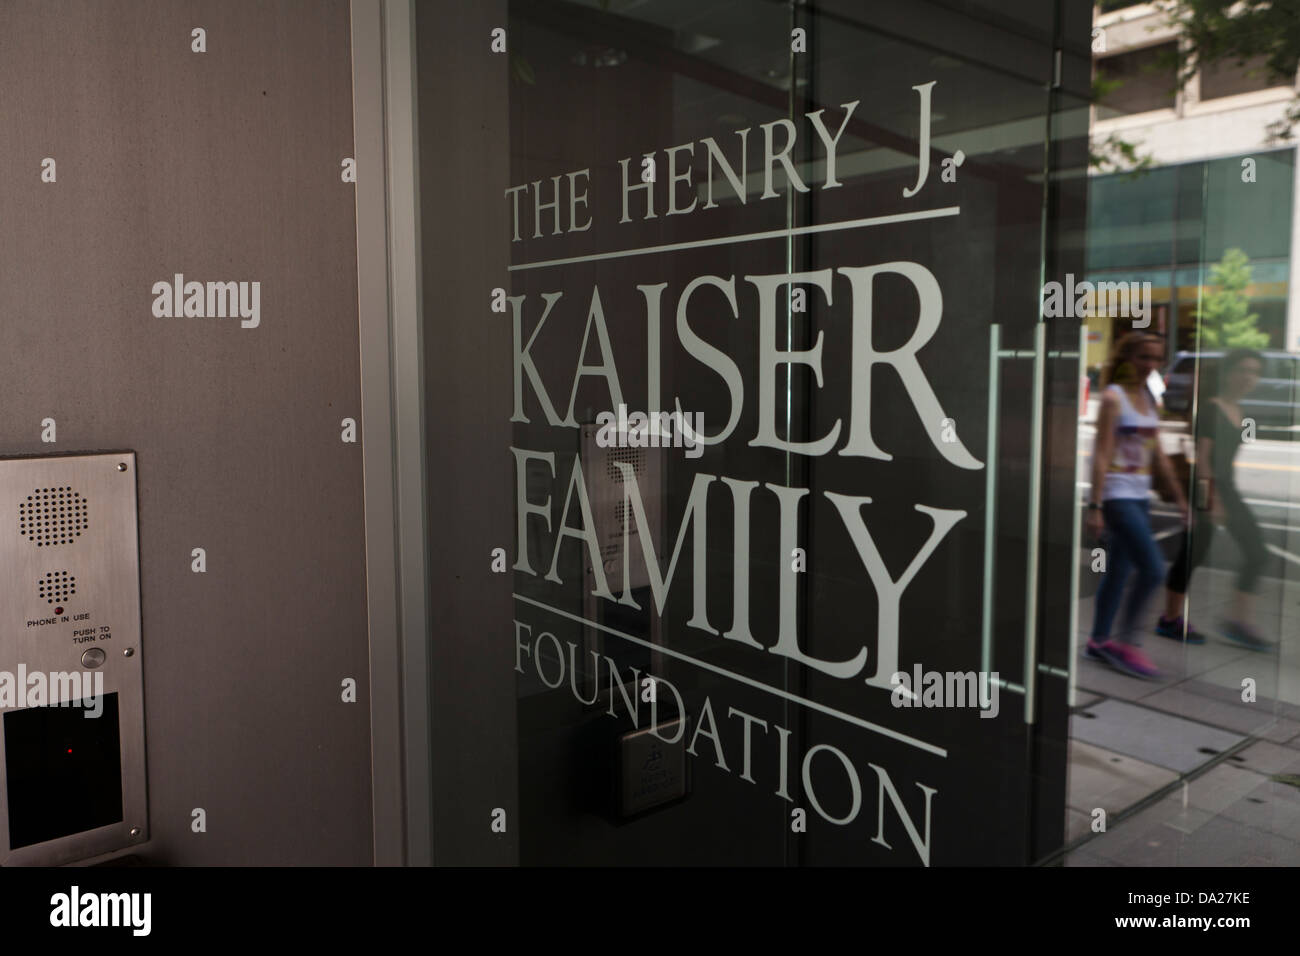 The Henry J Kaiser Family Foundation building, Washington DC - Stock Image